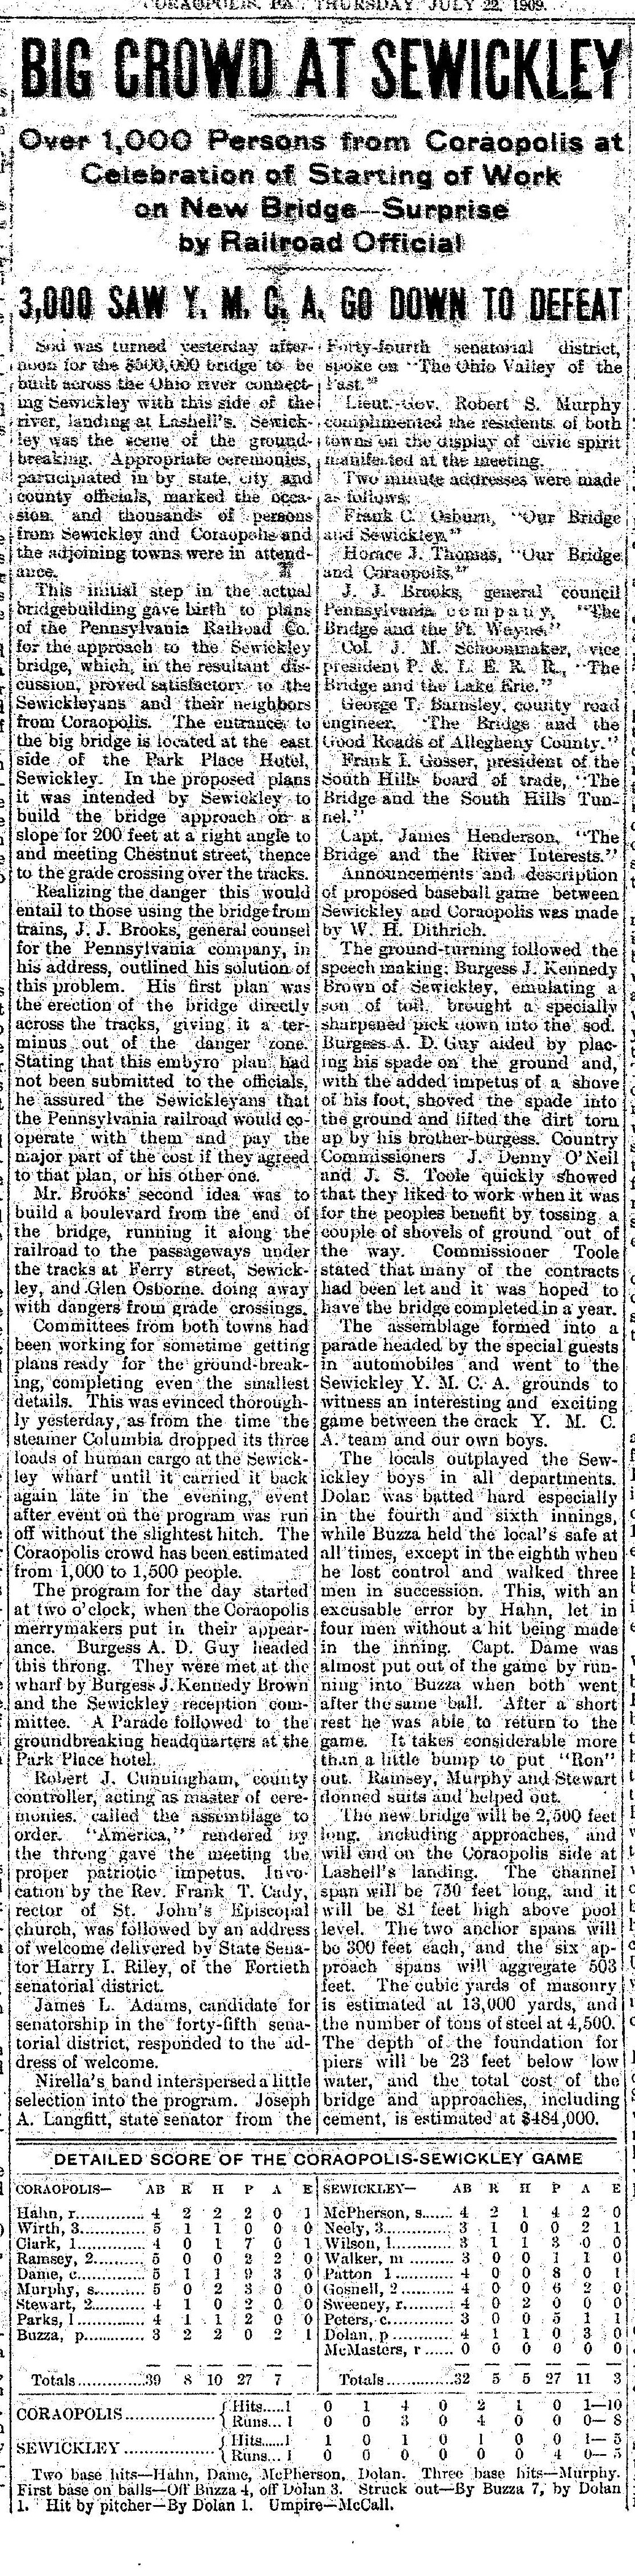 1909-07-22 The Coraopolis Record (vol IV, No21, p1).jpg